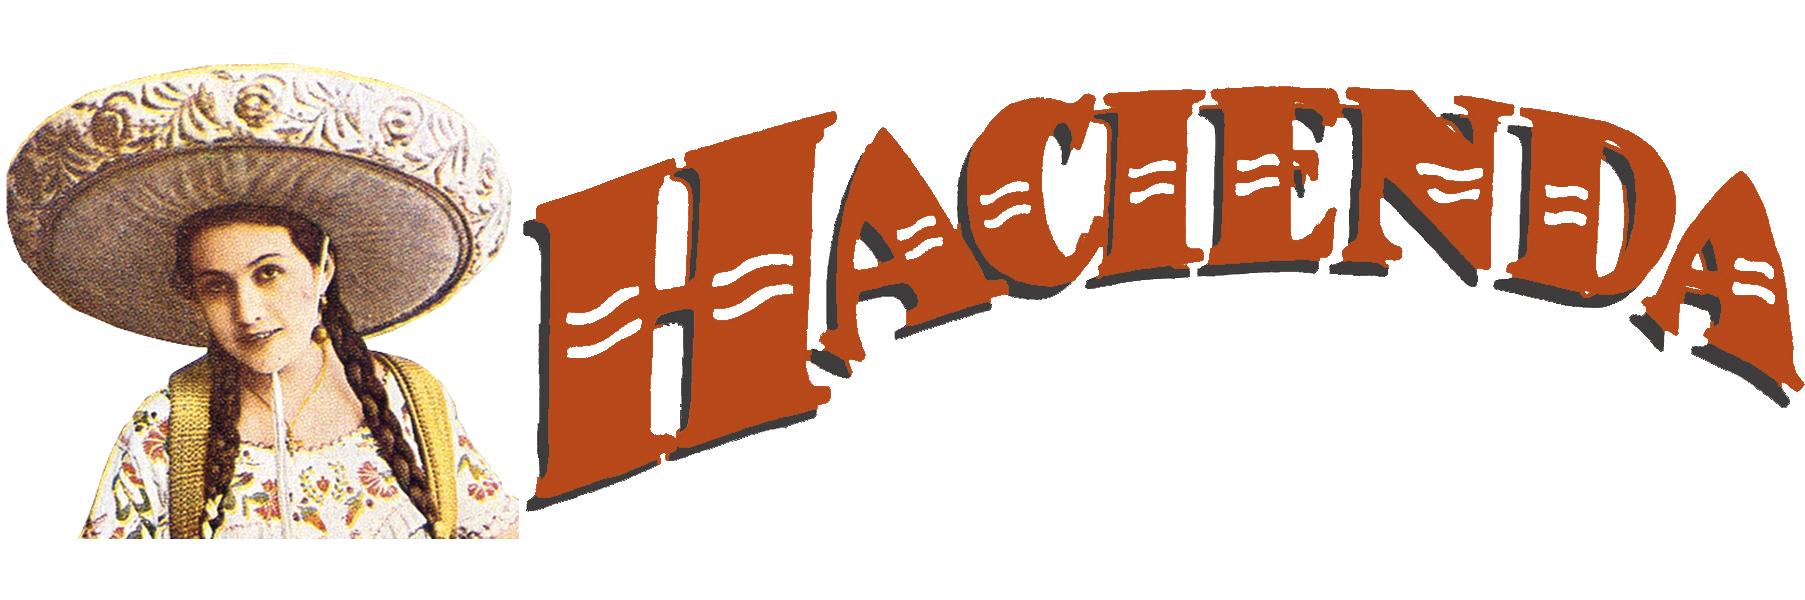 ninia sola hacienda orange 2